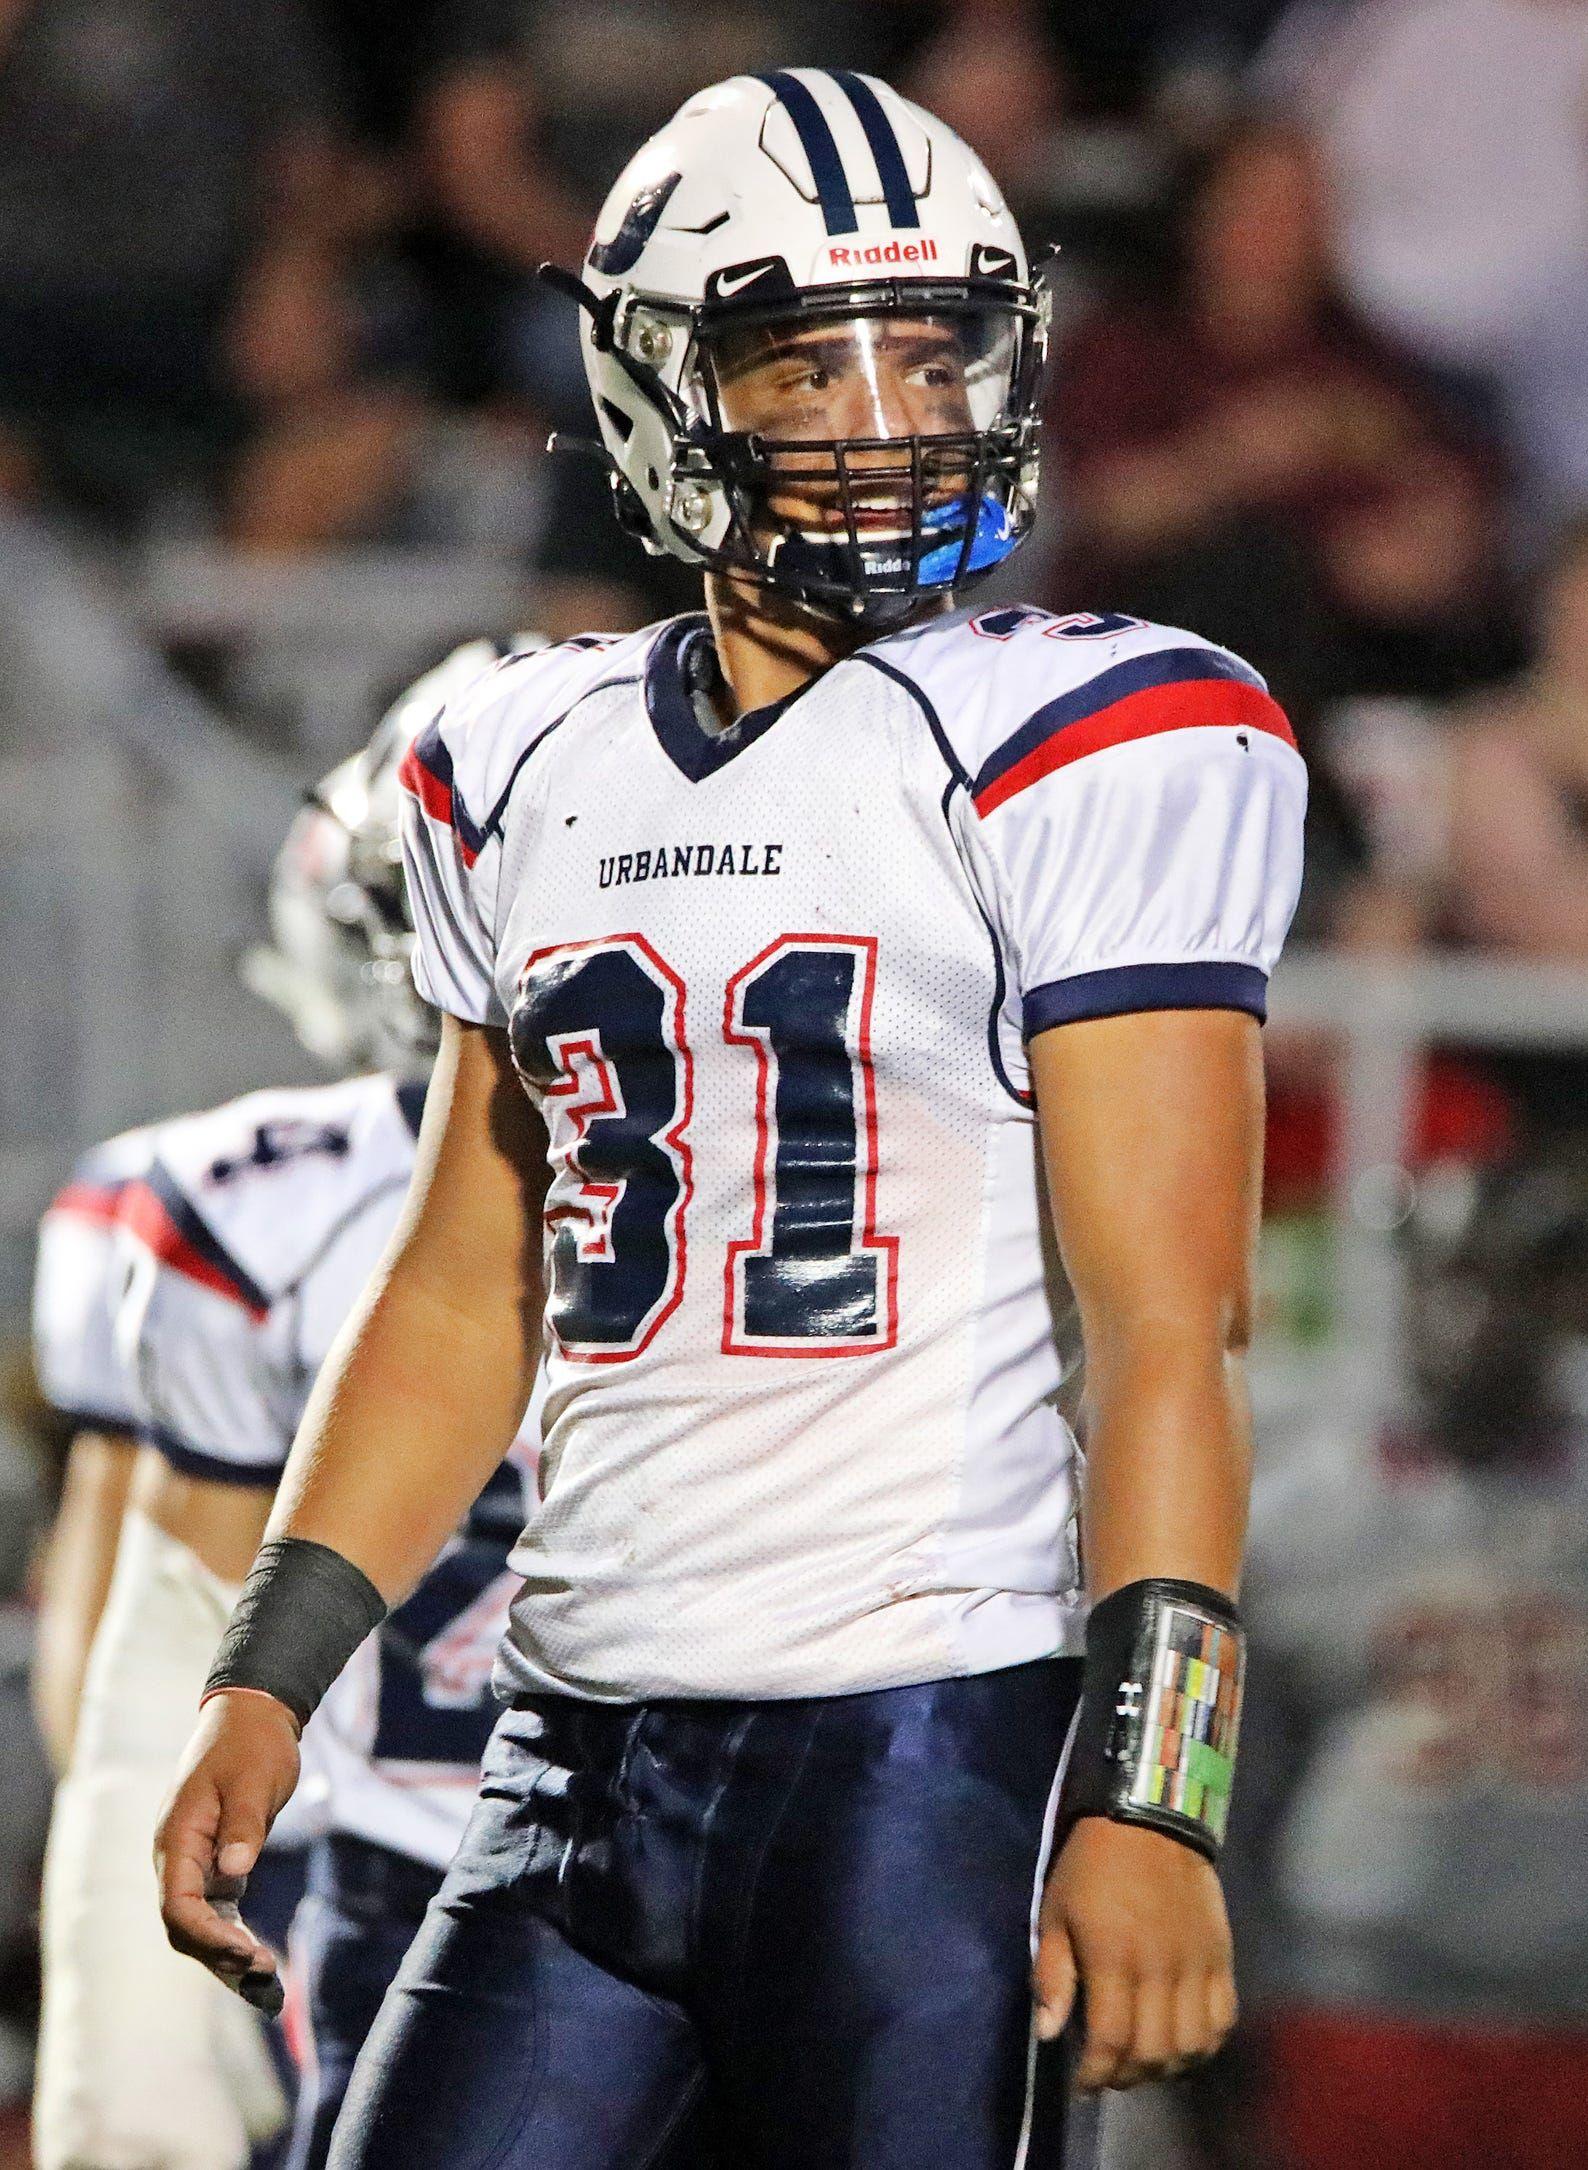 Week 3 Photos Central Iowa High School Football In 2020 Football High School Football Nfl Cheerleaders